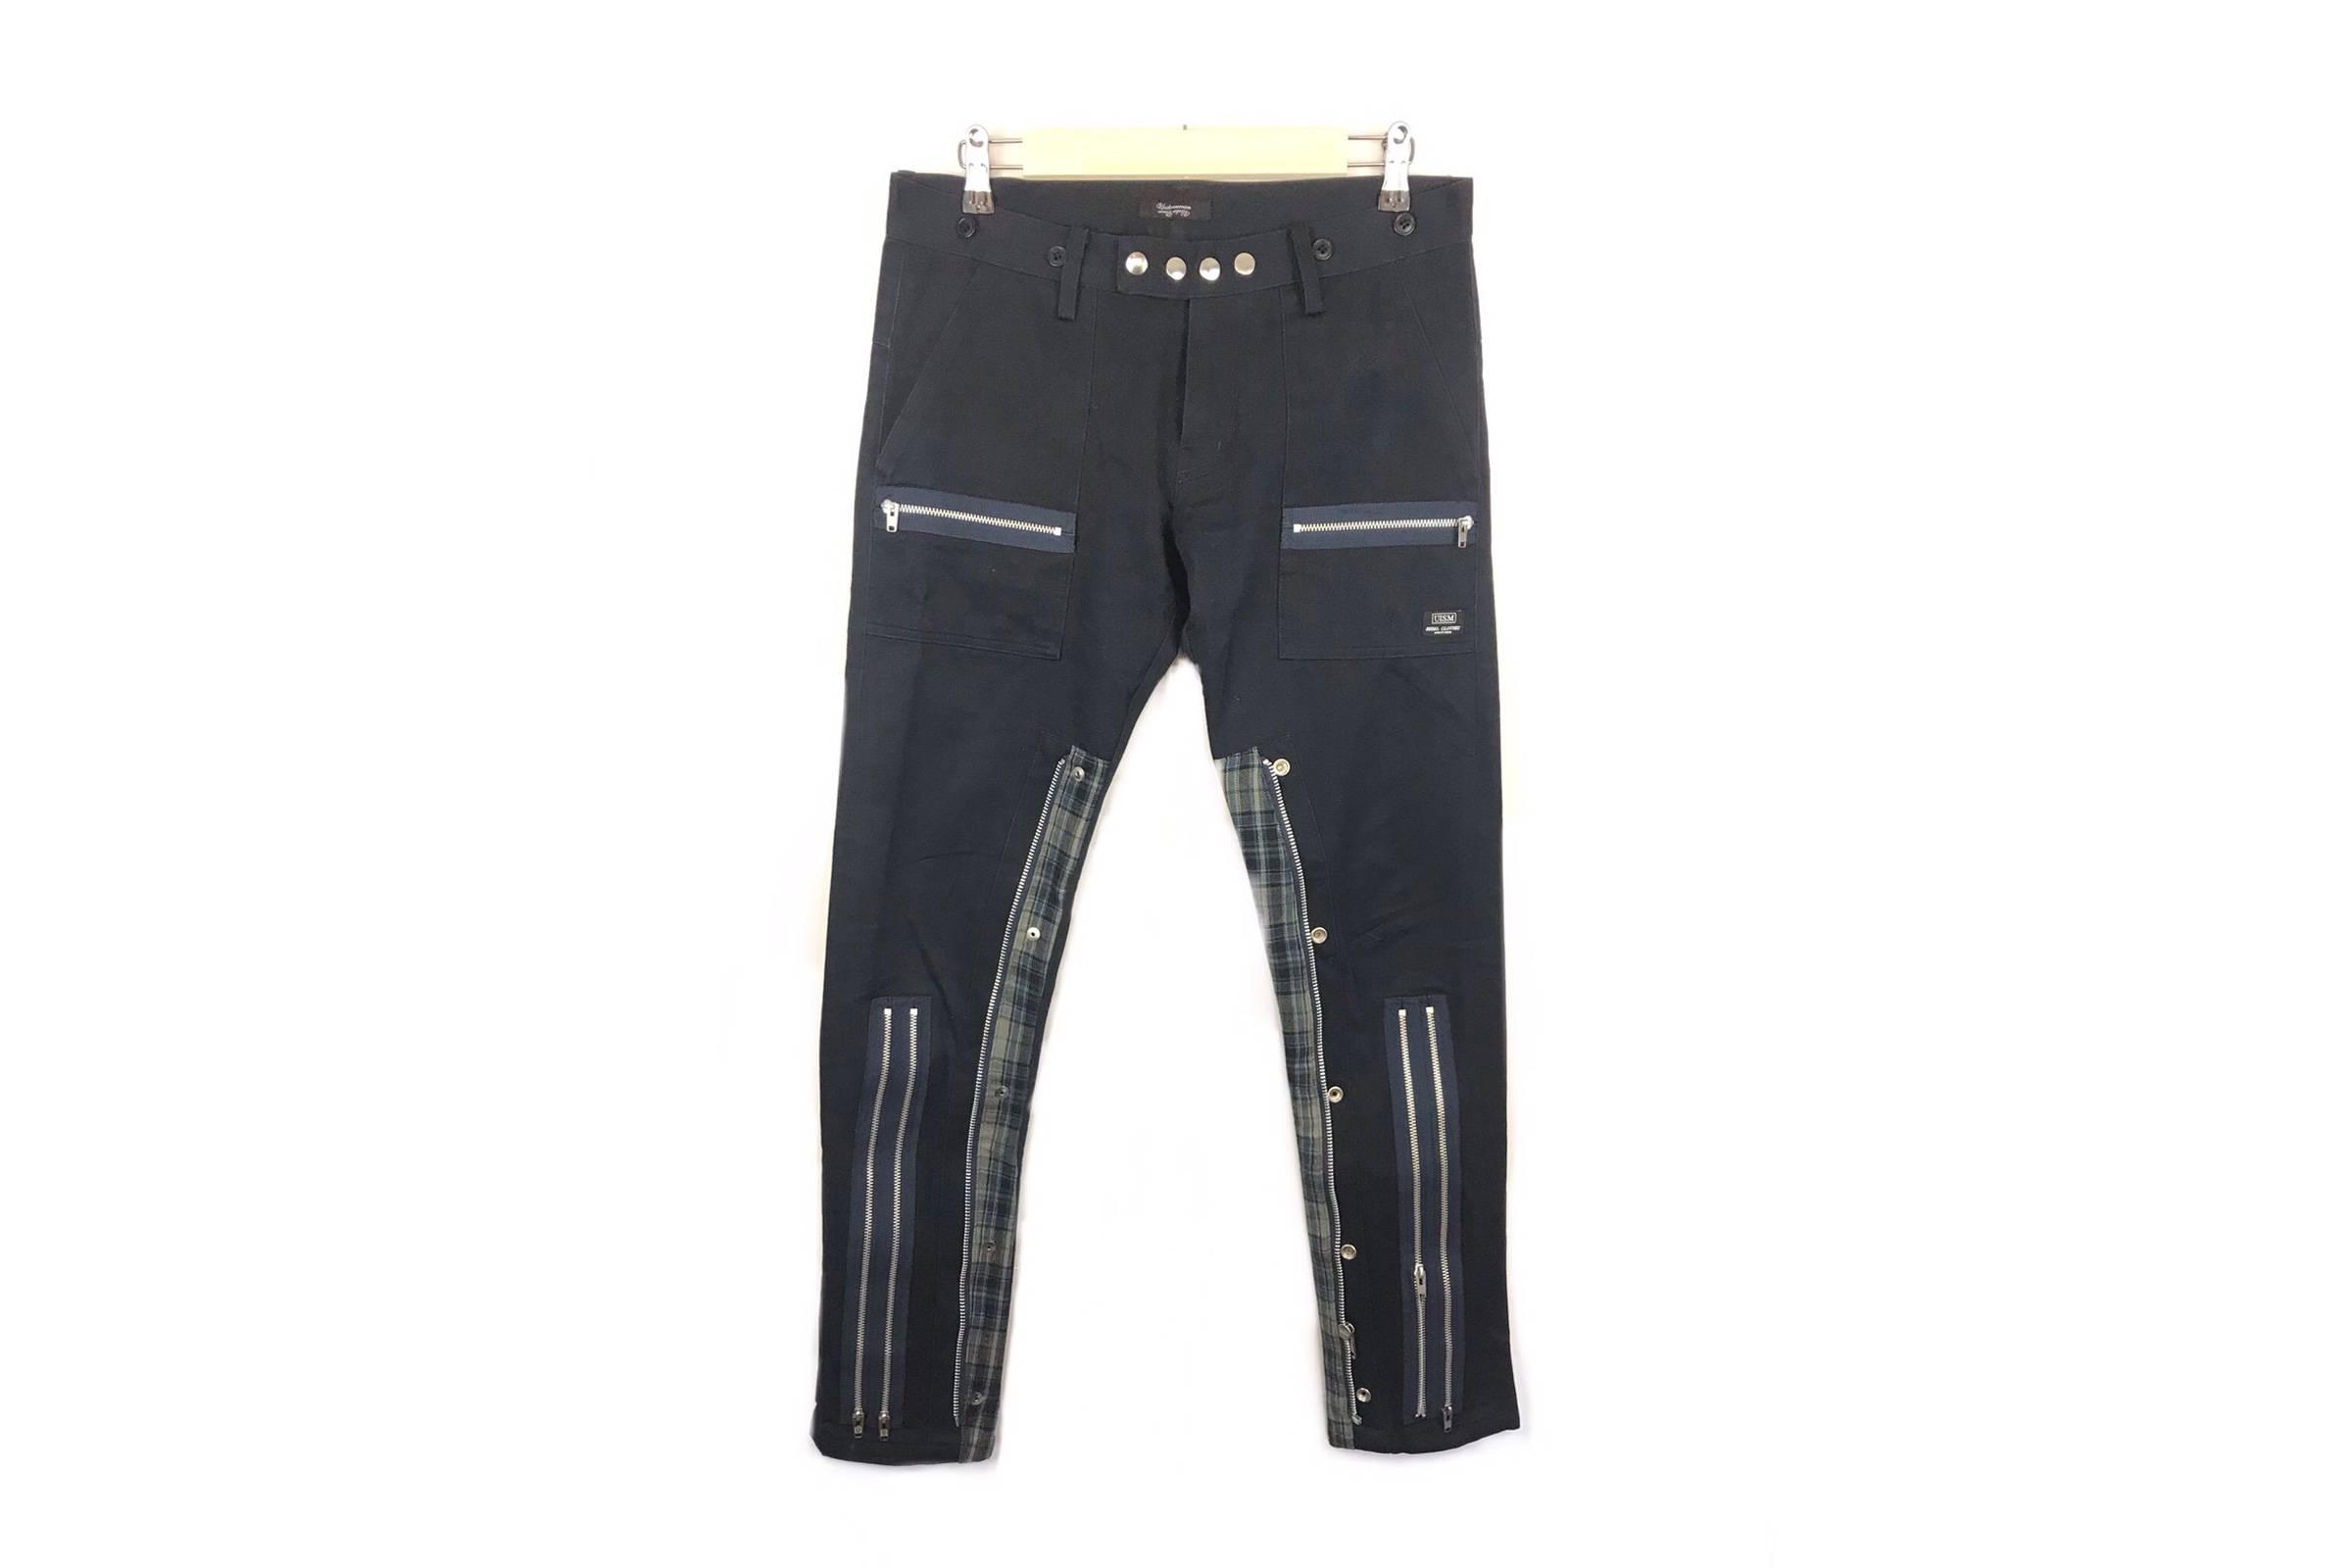 Undercover Fall/Winter 2008 Bondage Pants